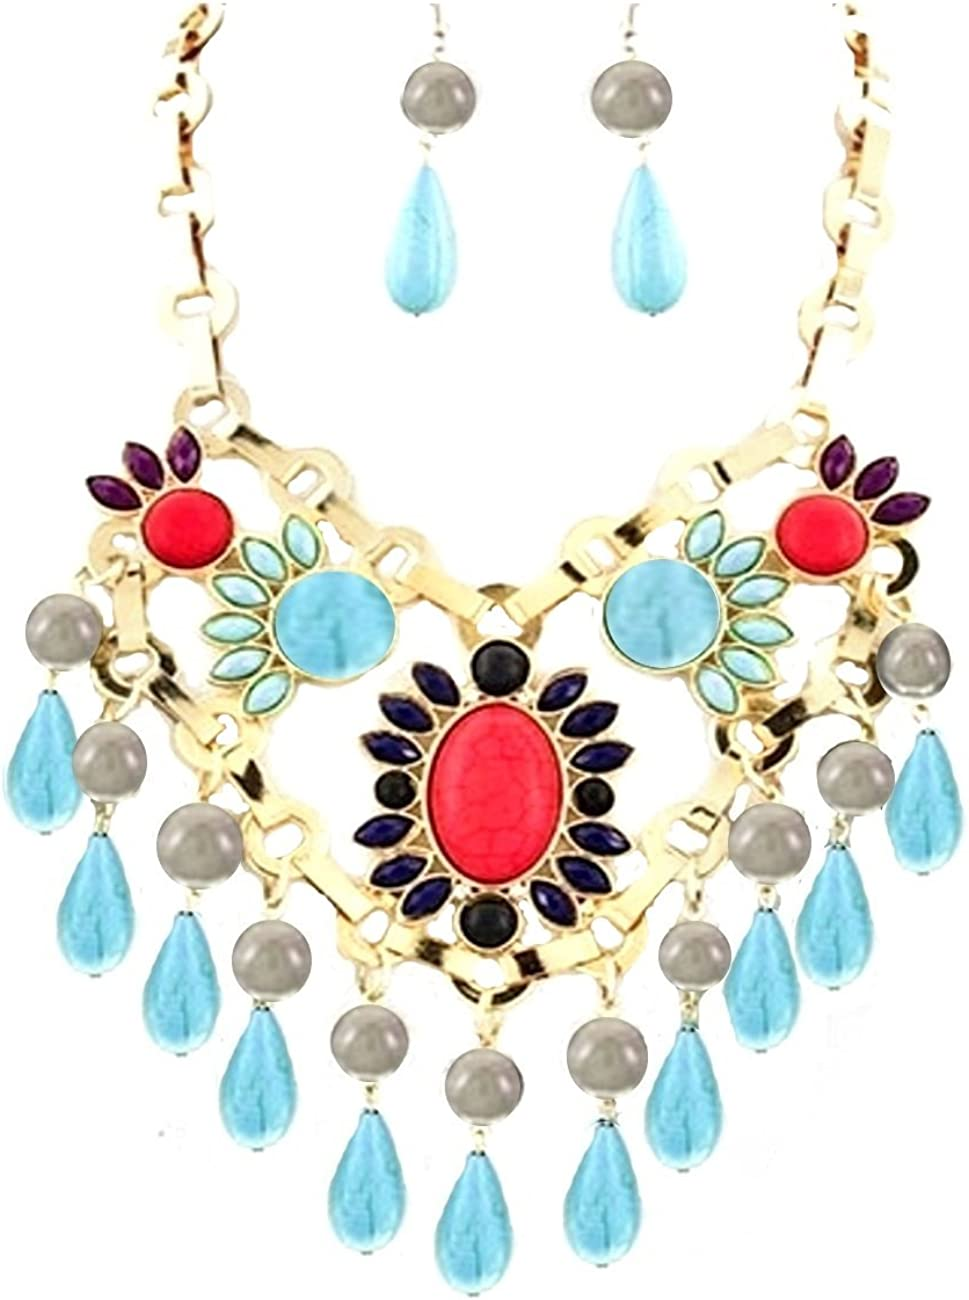 Joyas Ant Symphony mano Luxus Juego de pendientes Dorado joyas piedra piedra natural turquesa Turquoise Rojo Gris Magenta púrpura azul